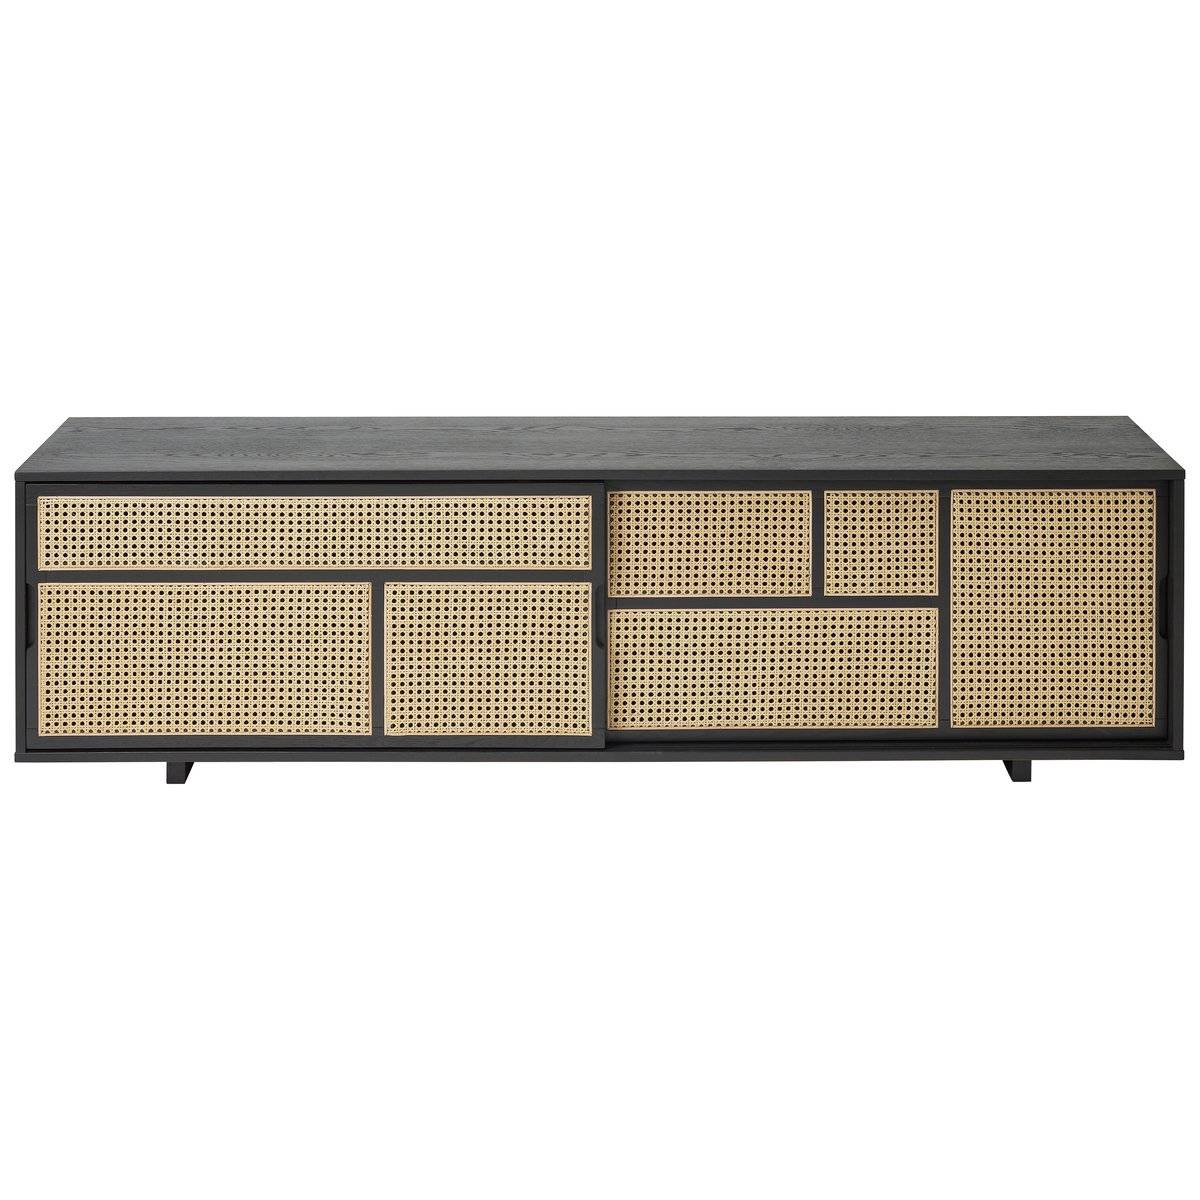 Design House Air sidebord, lavt svart, rotting